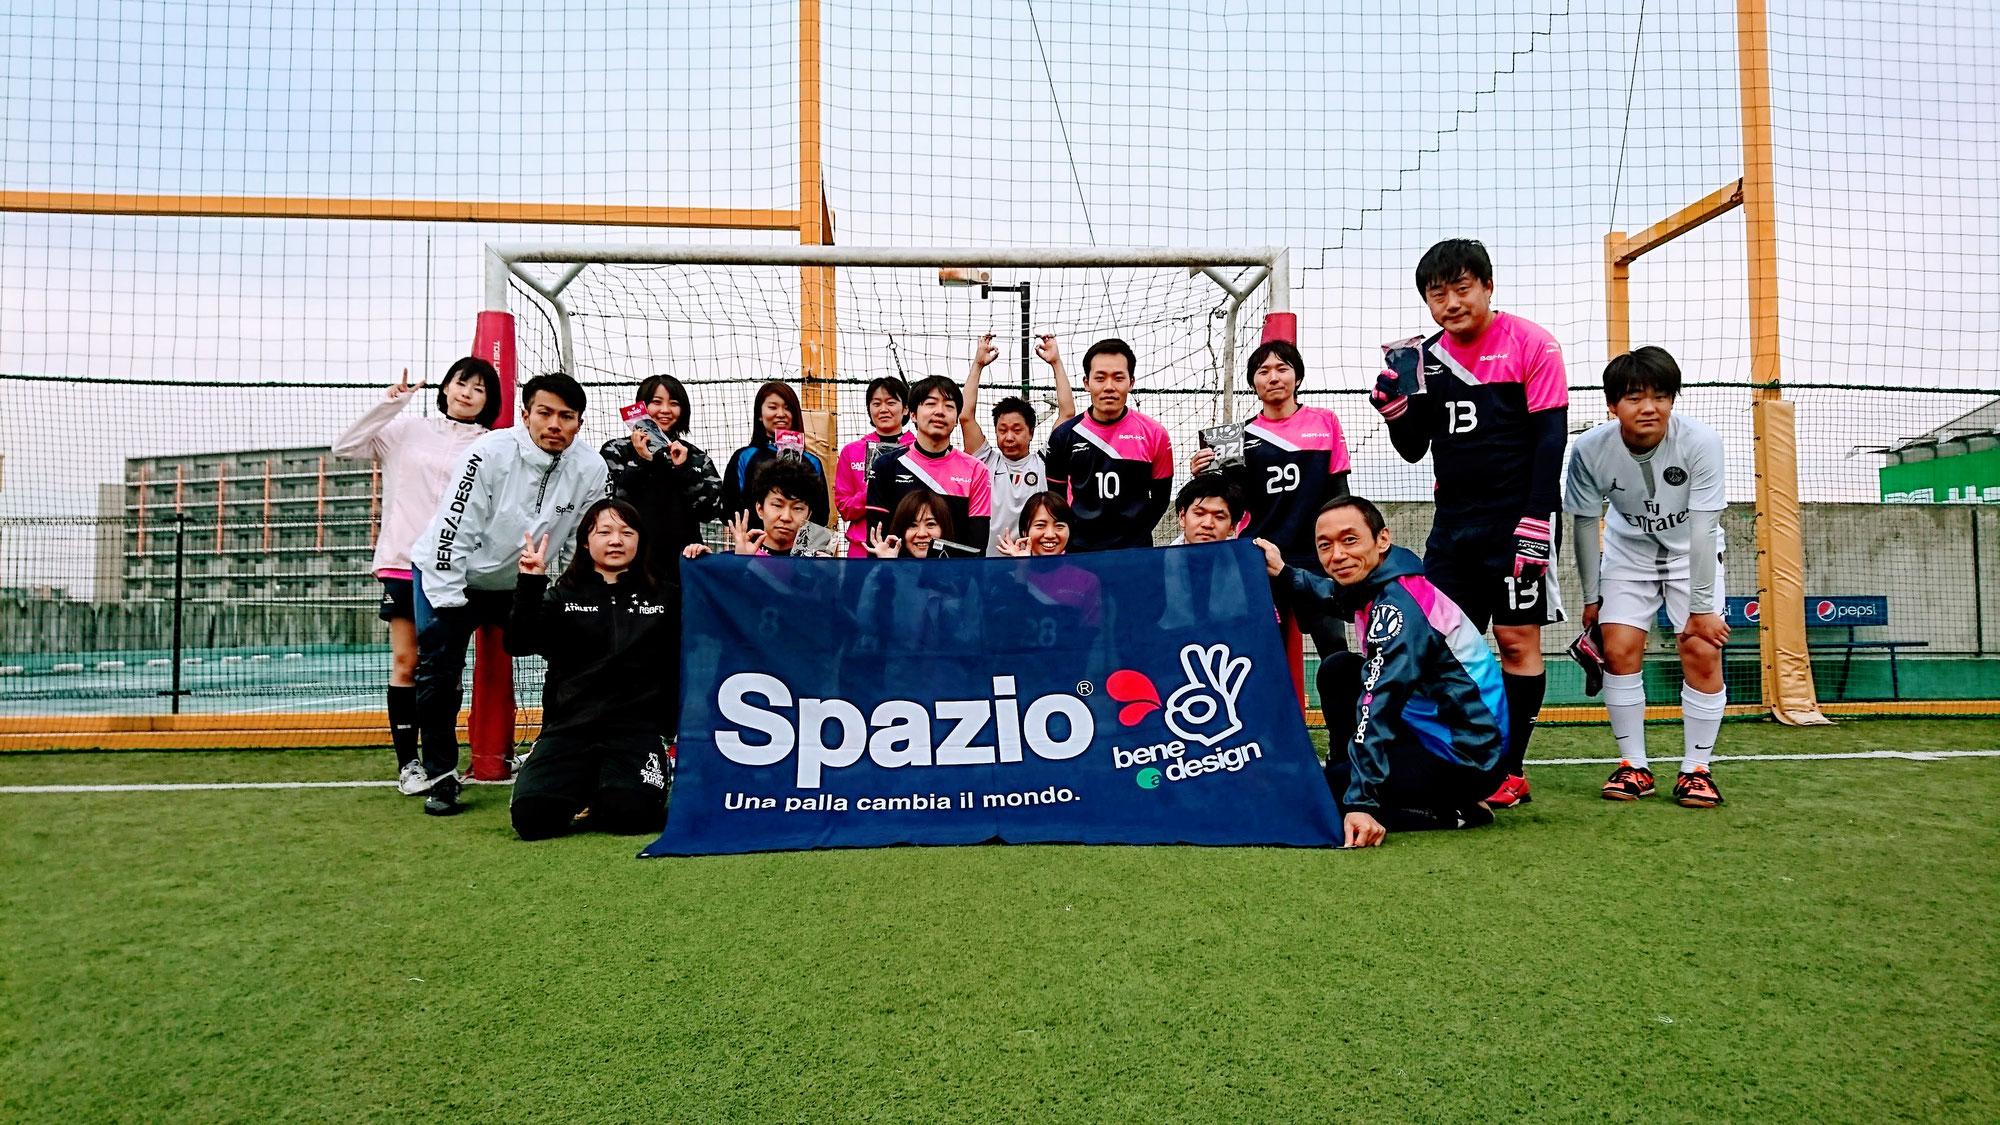 12/22Spazio×太見寿人フットサルクリニック、 Spazio CUP エンジョイフットサル大会レポート